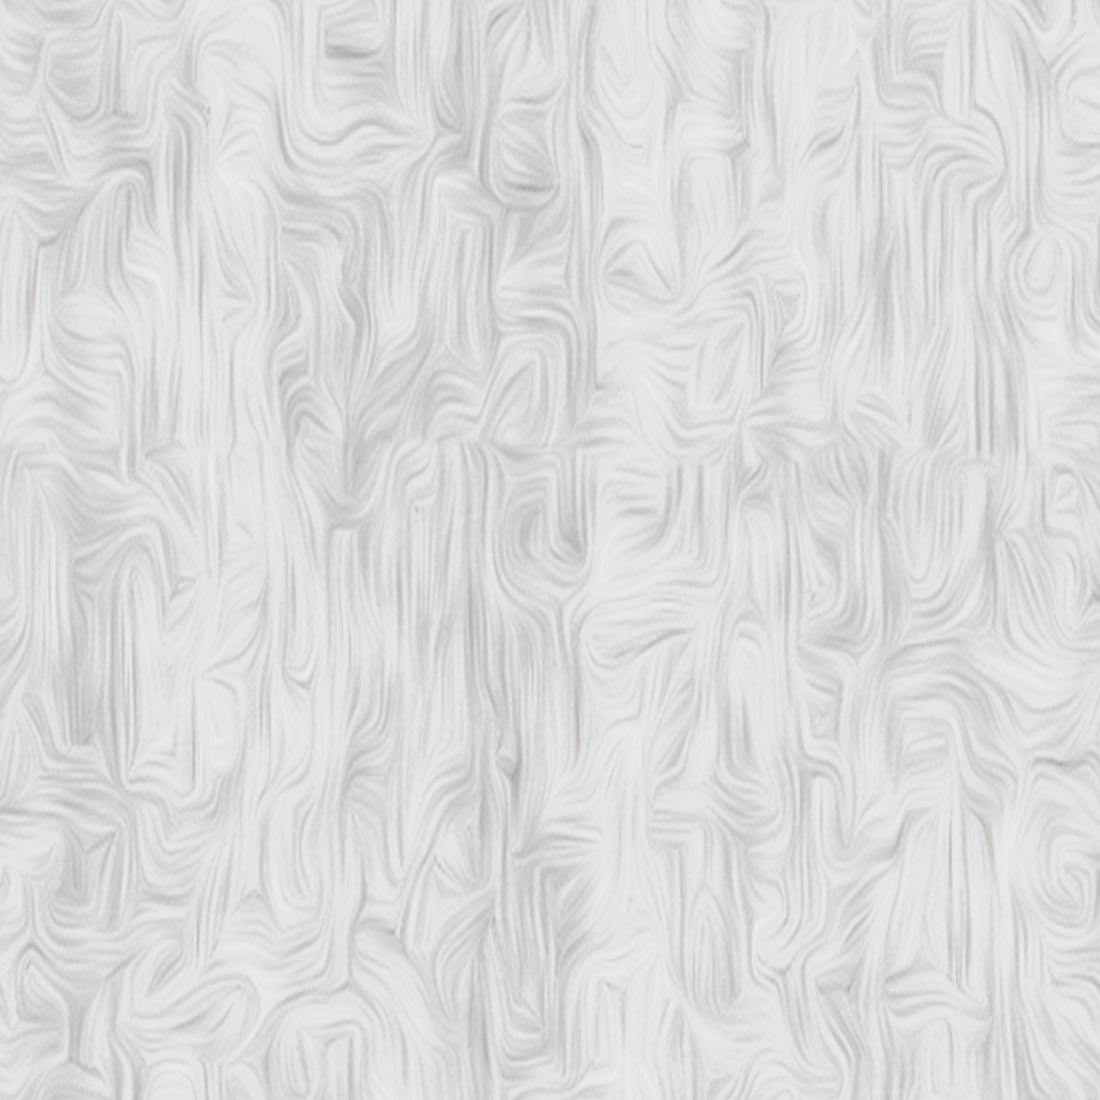 Papel de parede quarto casal textura - Paredes de papel ...